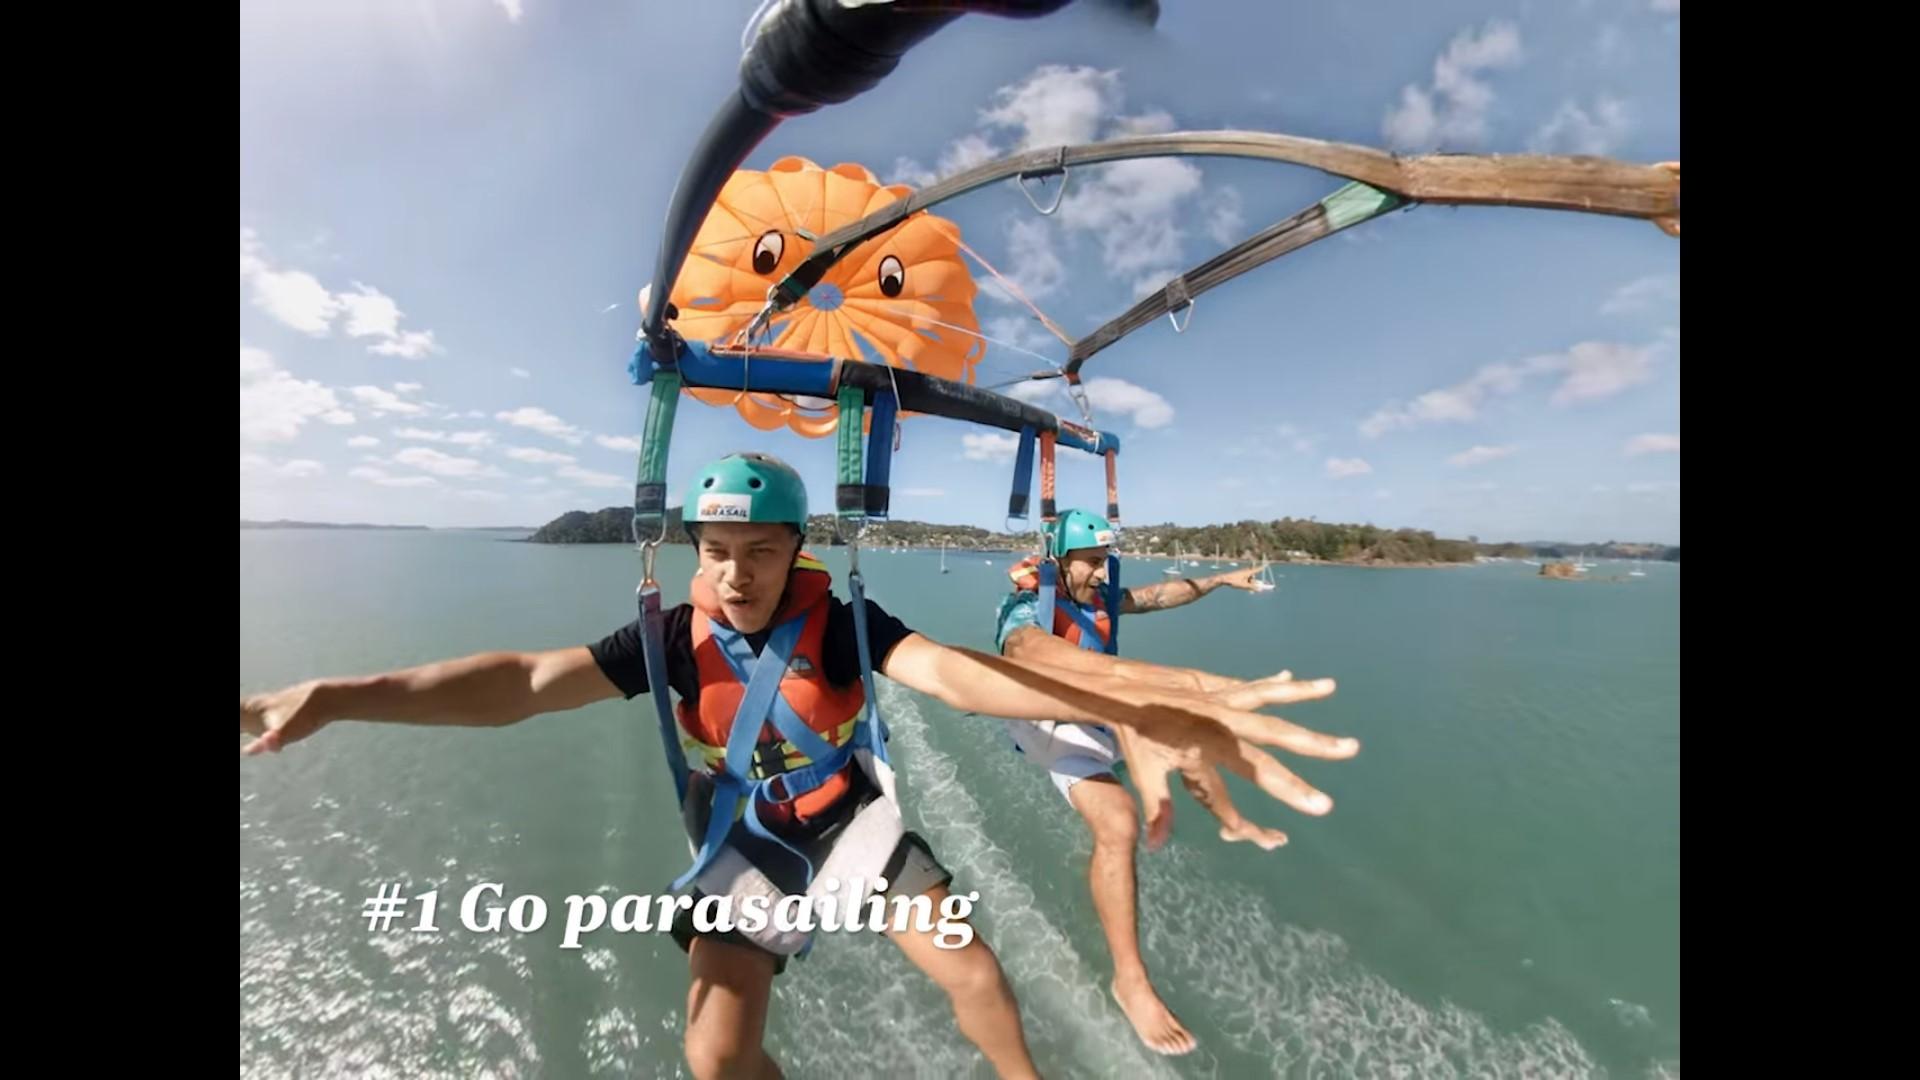 29f045b87c Air NZ's new Bay of Islands video clocks up 600,000 views in a week ...